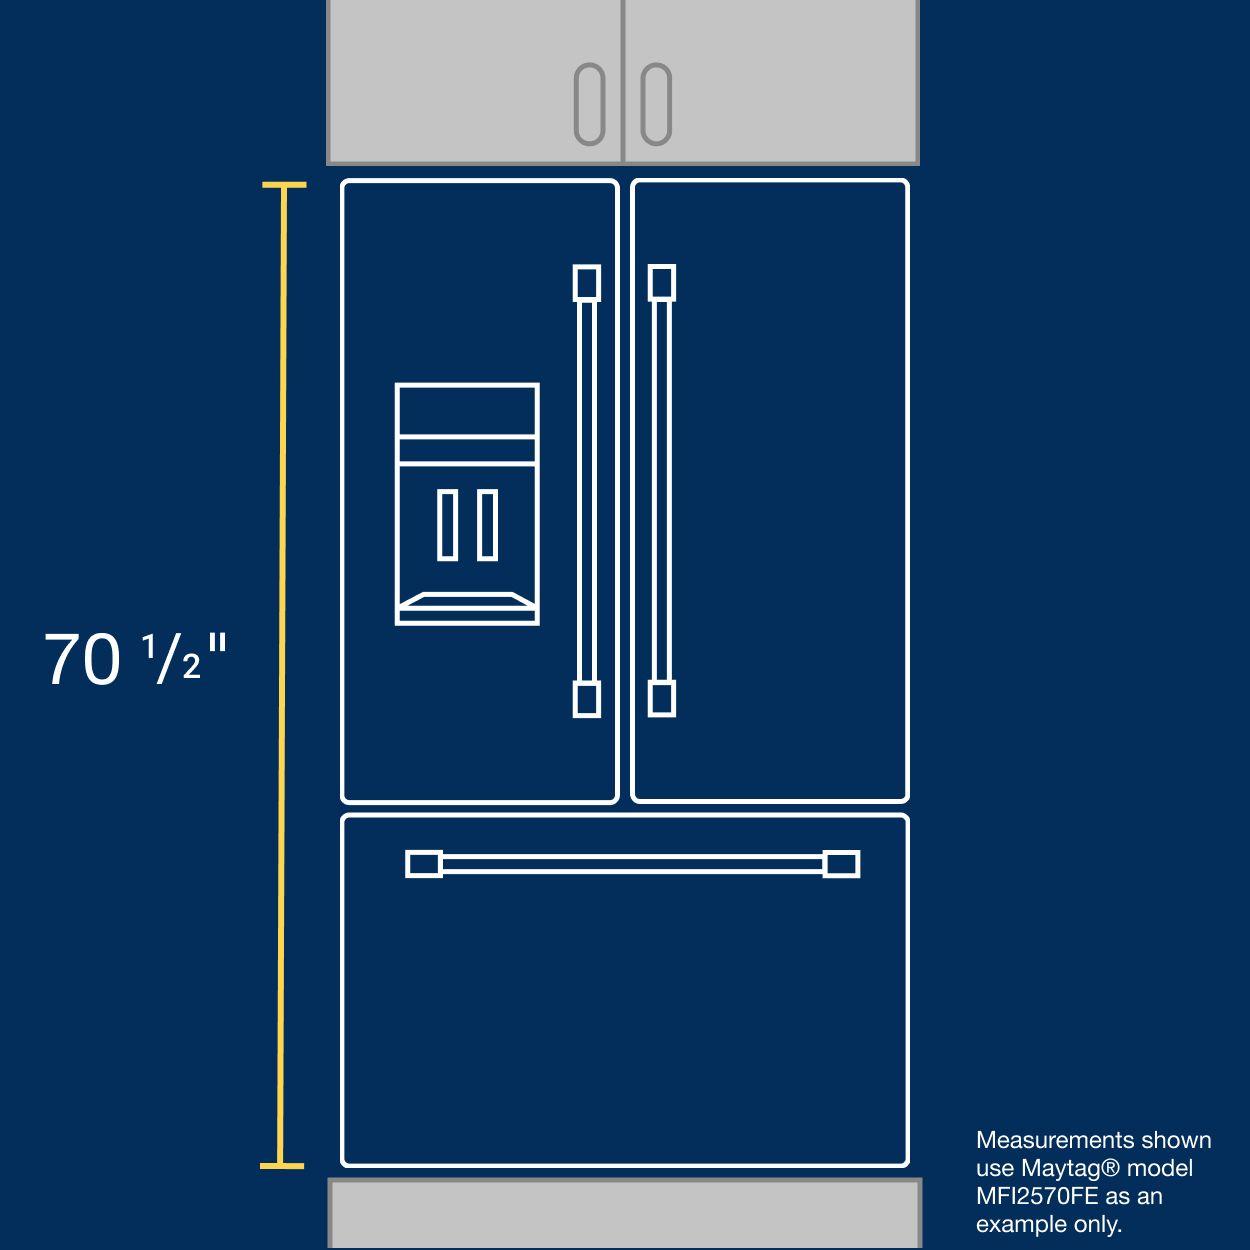 Measuring refrigerator height